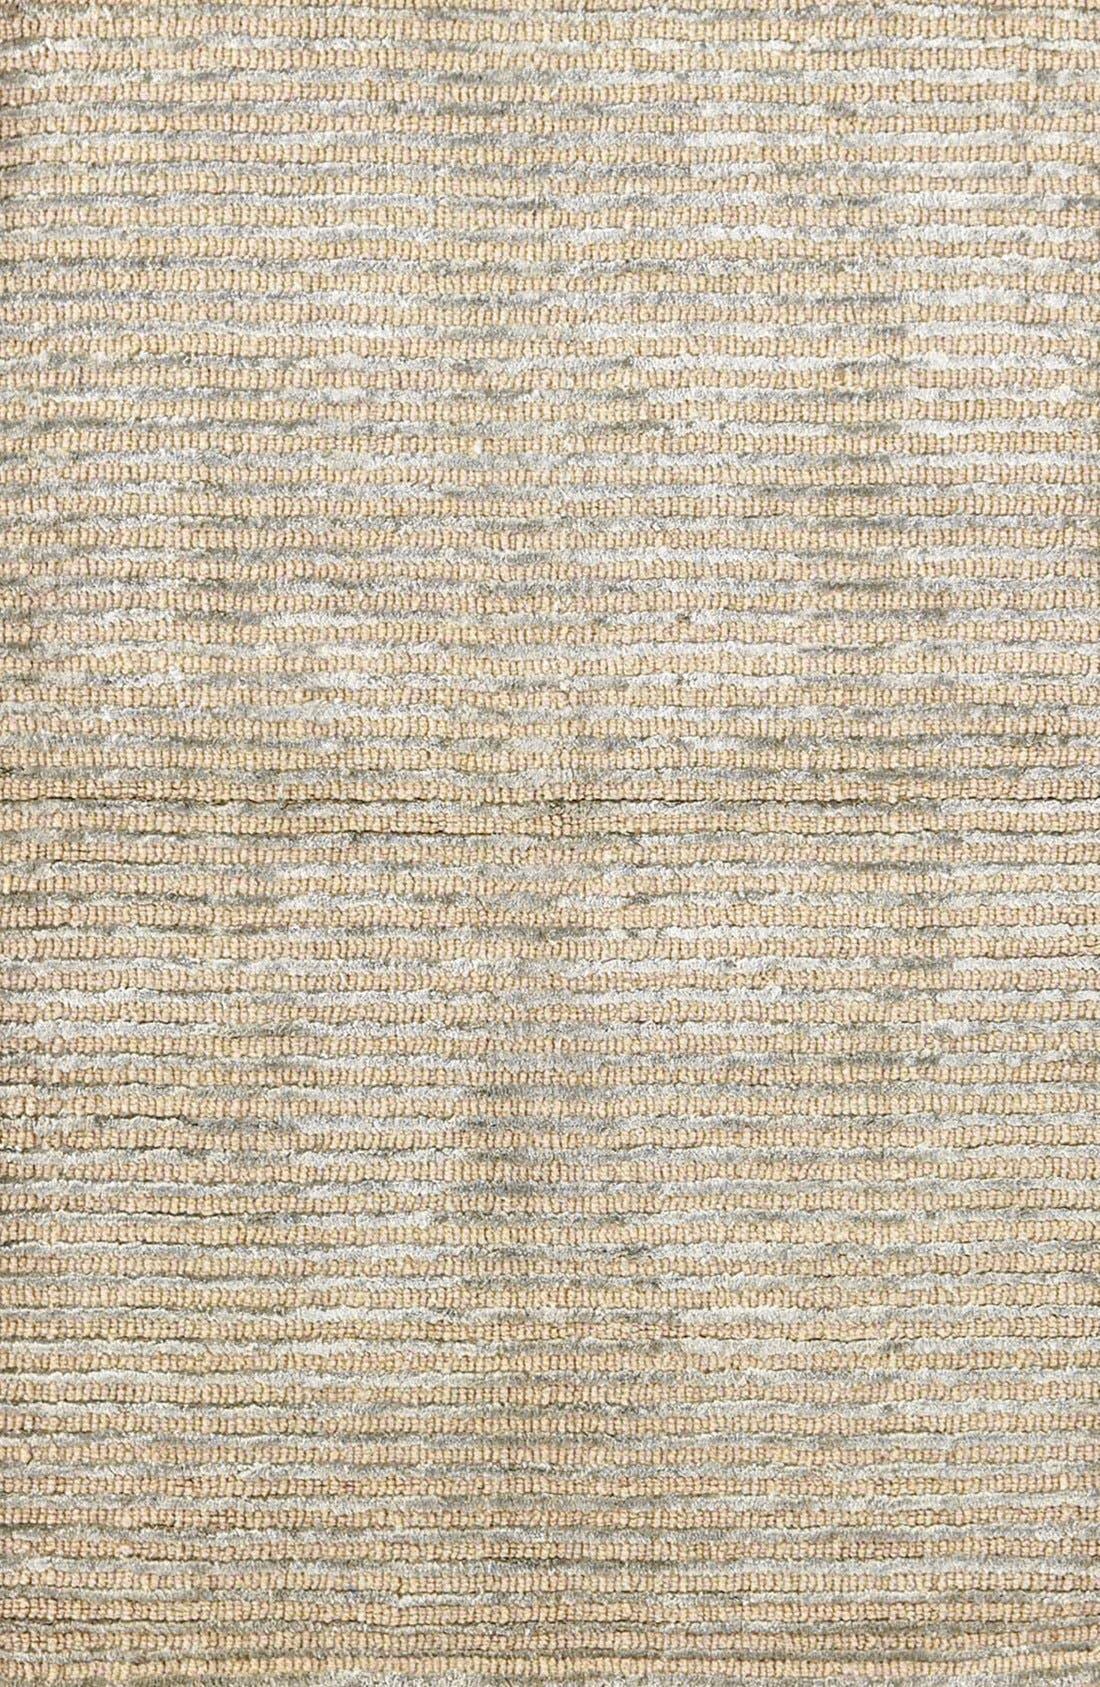 Main Image - Dash & Albert Stripe Rug